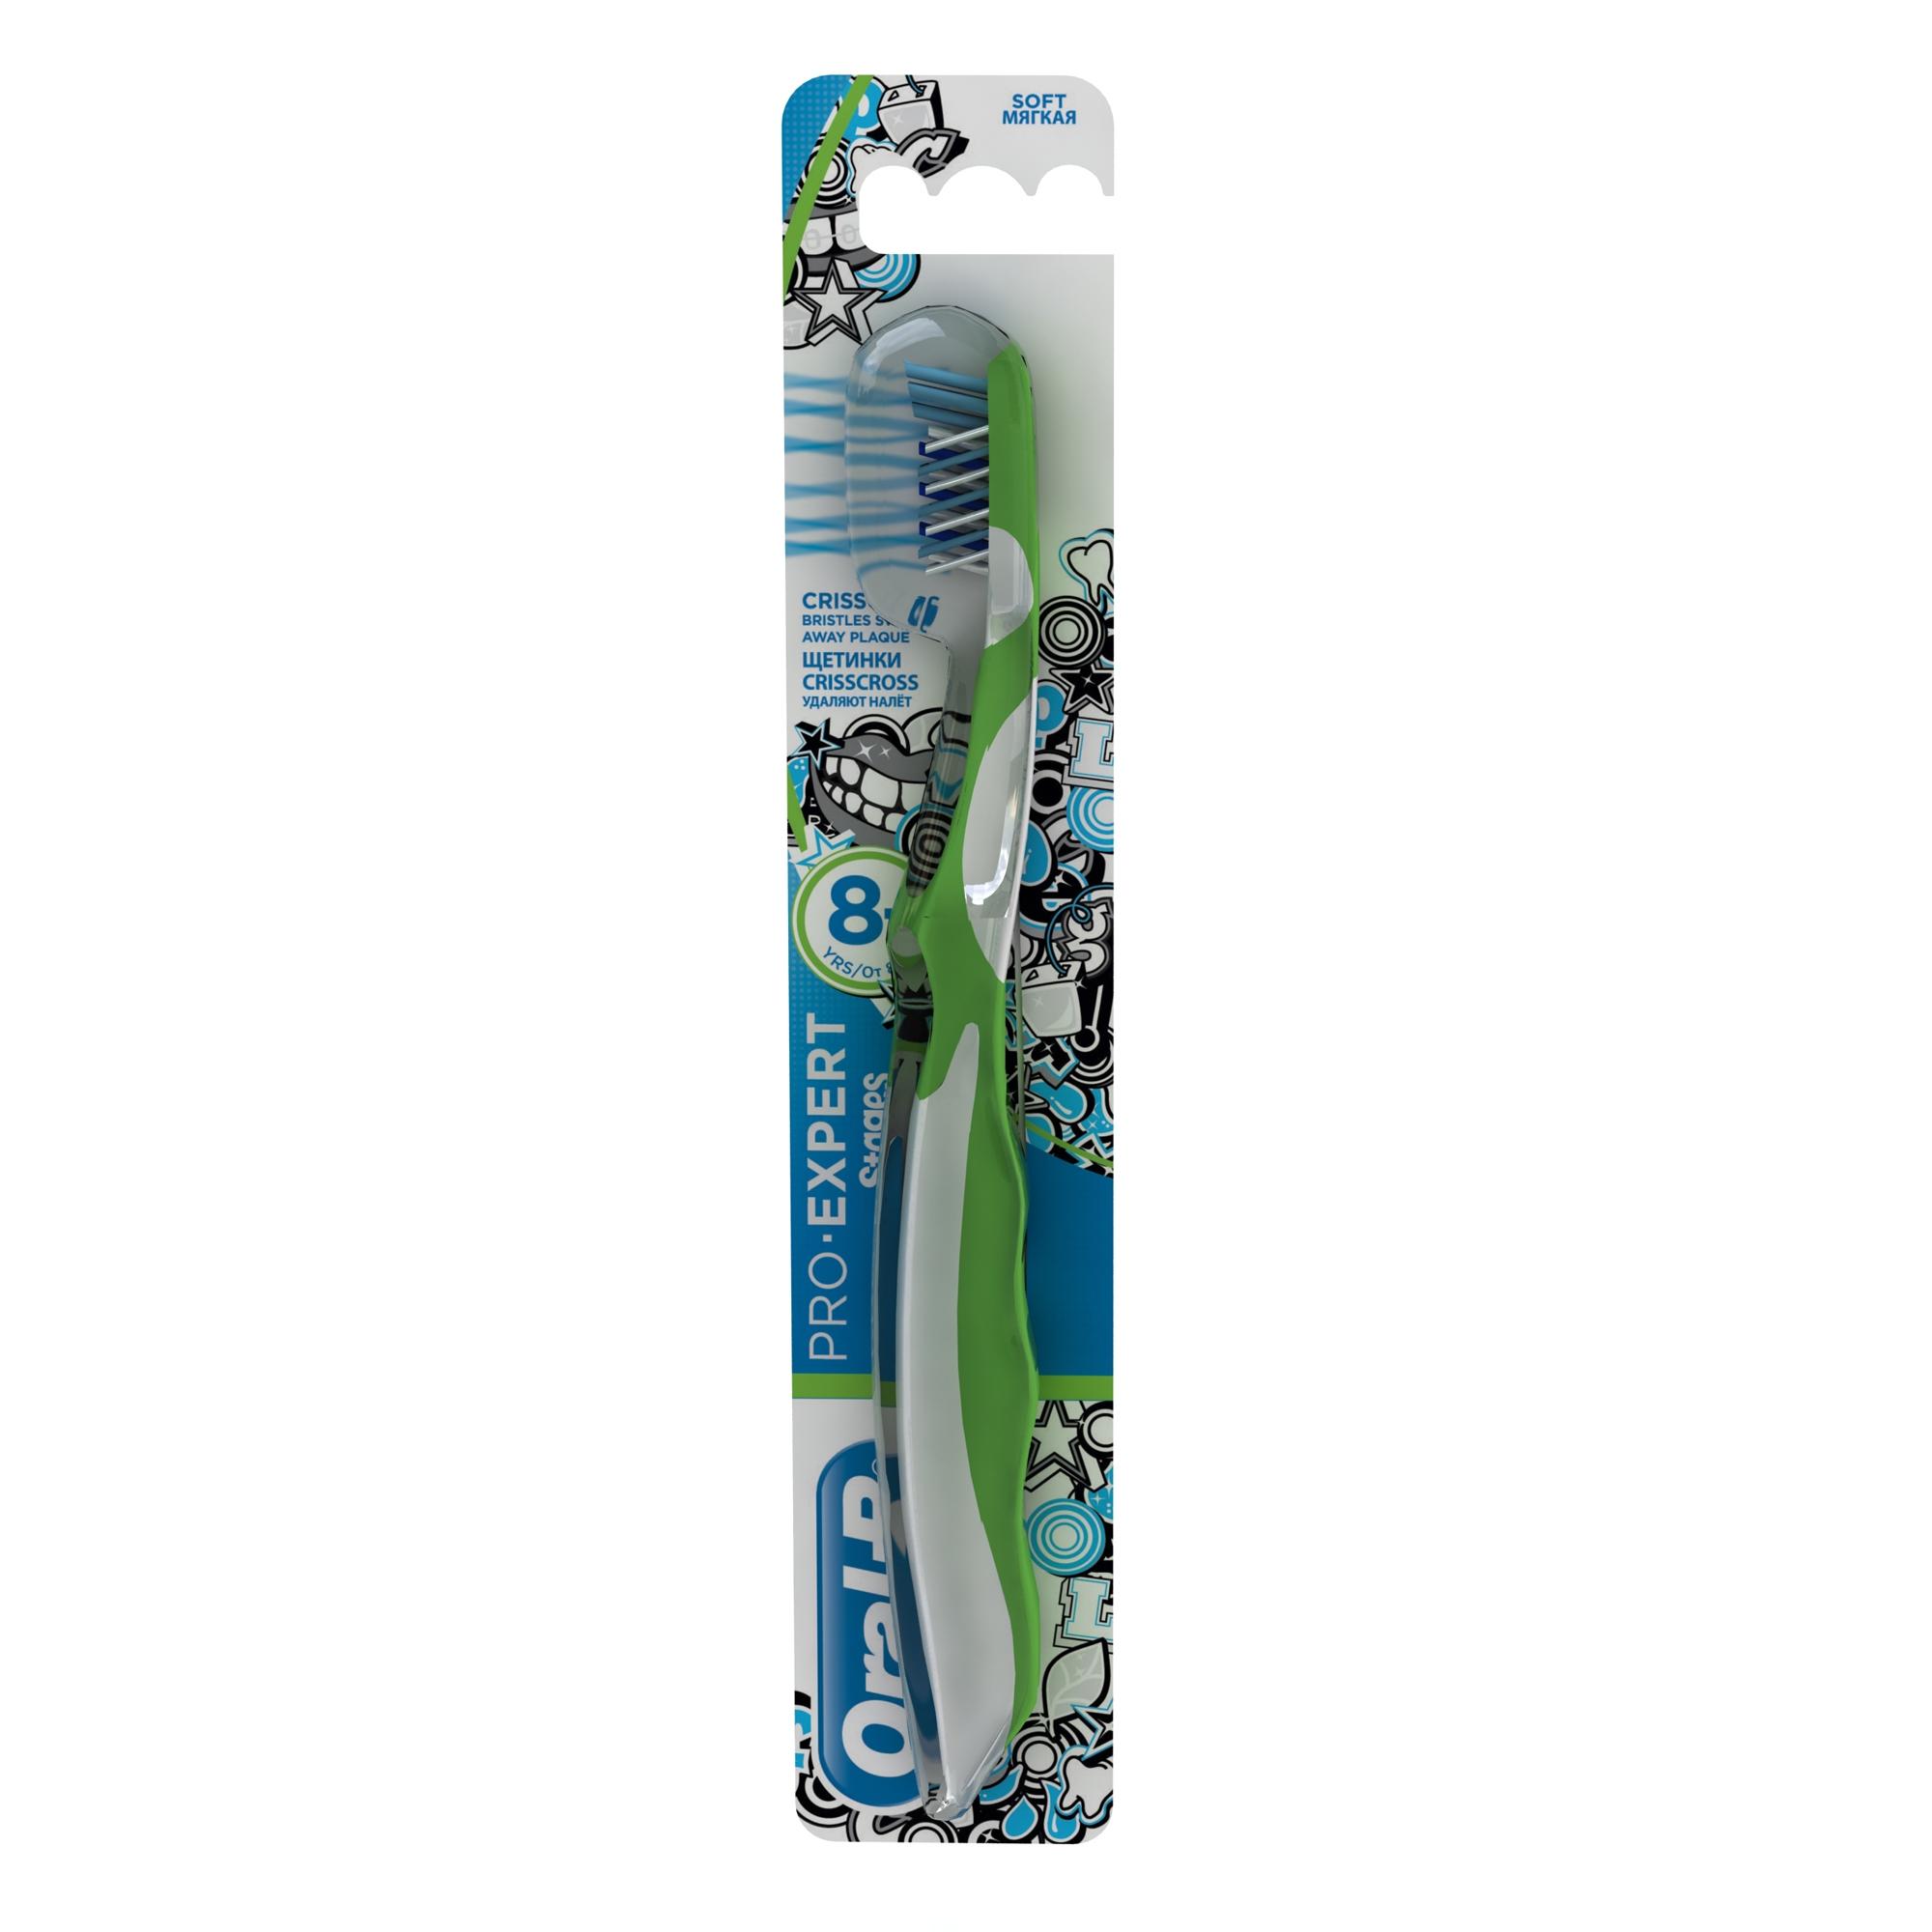 Зубные щетки и пасты Oral-B Stages ProExpert waterpulse professional oral care teeth cleaner irrigator electric oral irrigator dental flosser